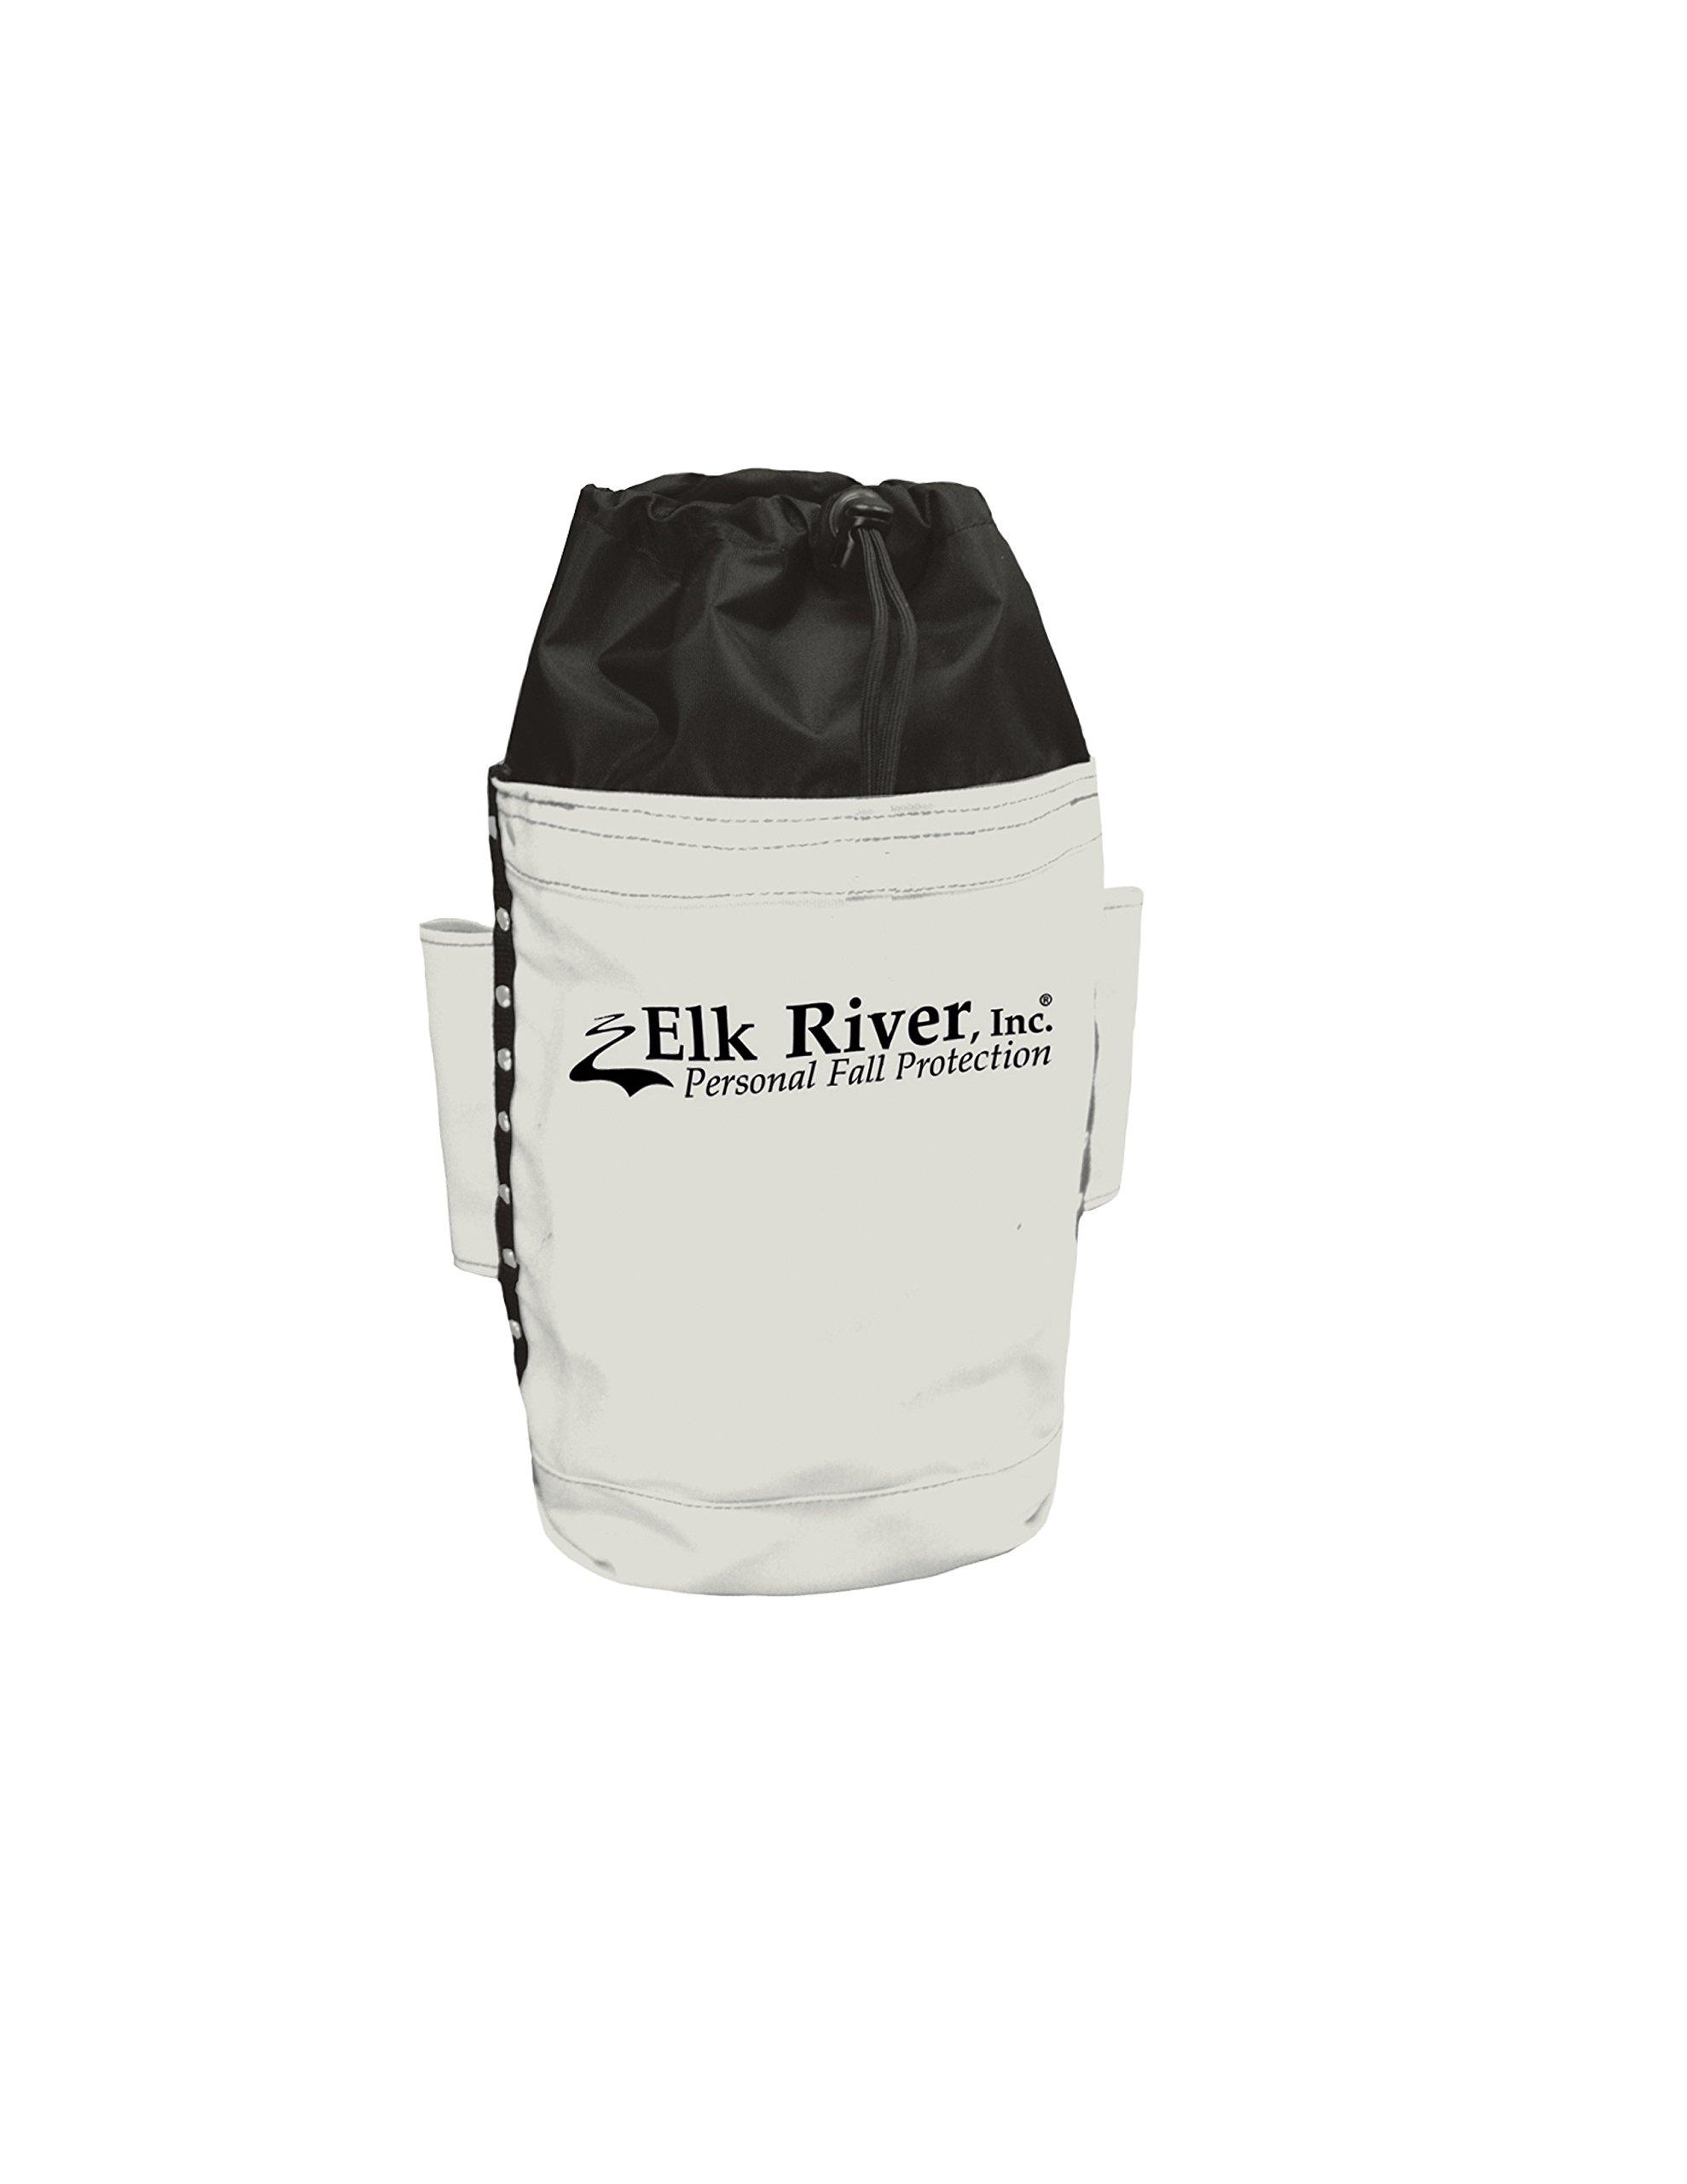 Elk River 84522 Canvas Deep Bolt Bag, 10'' Length x 2-1/2'' Width x 14'' Depth by Elk River